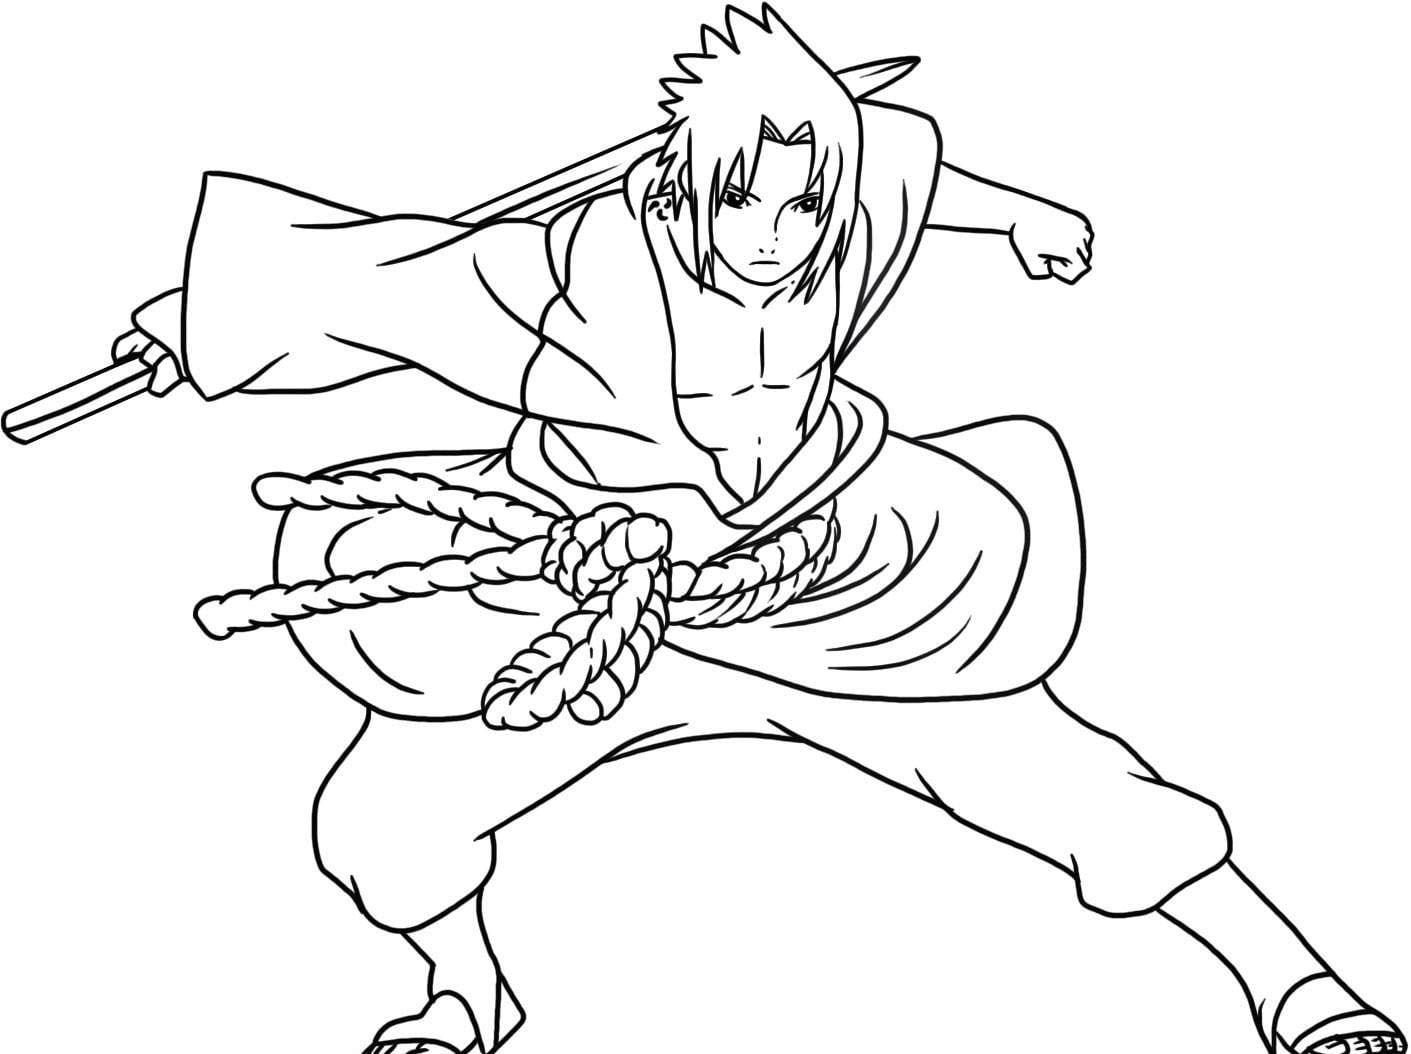 Imagens Para Pintar Do Naruto